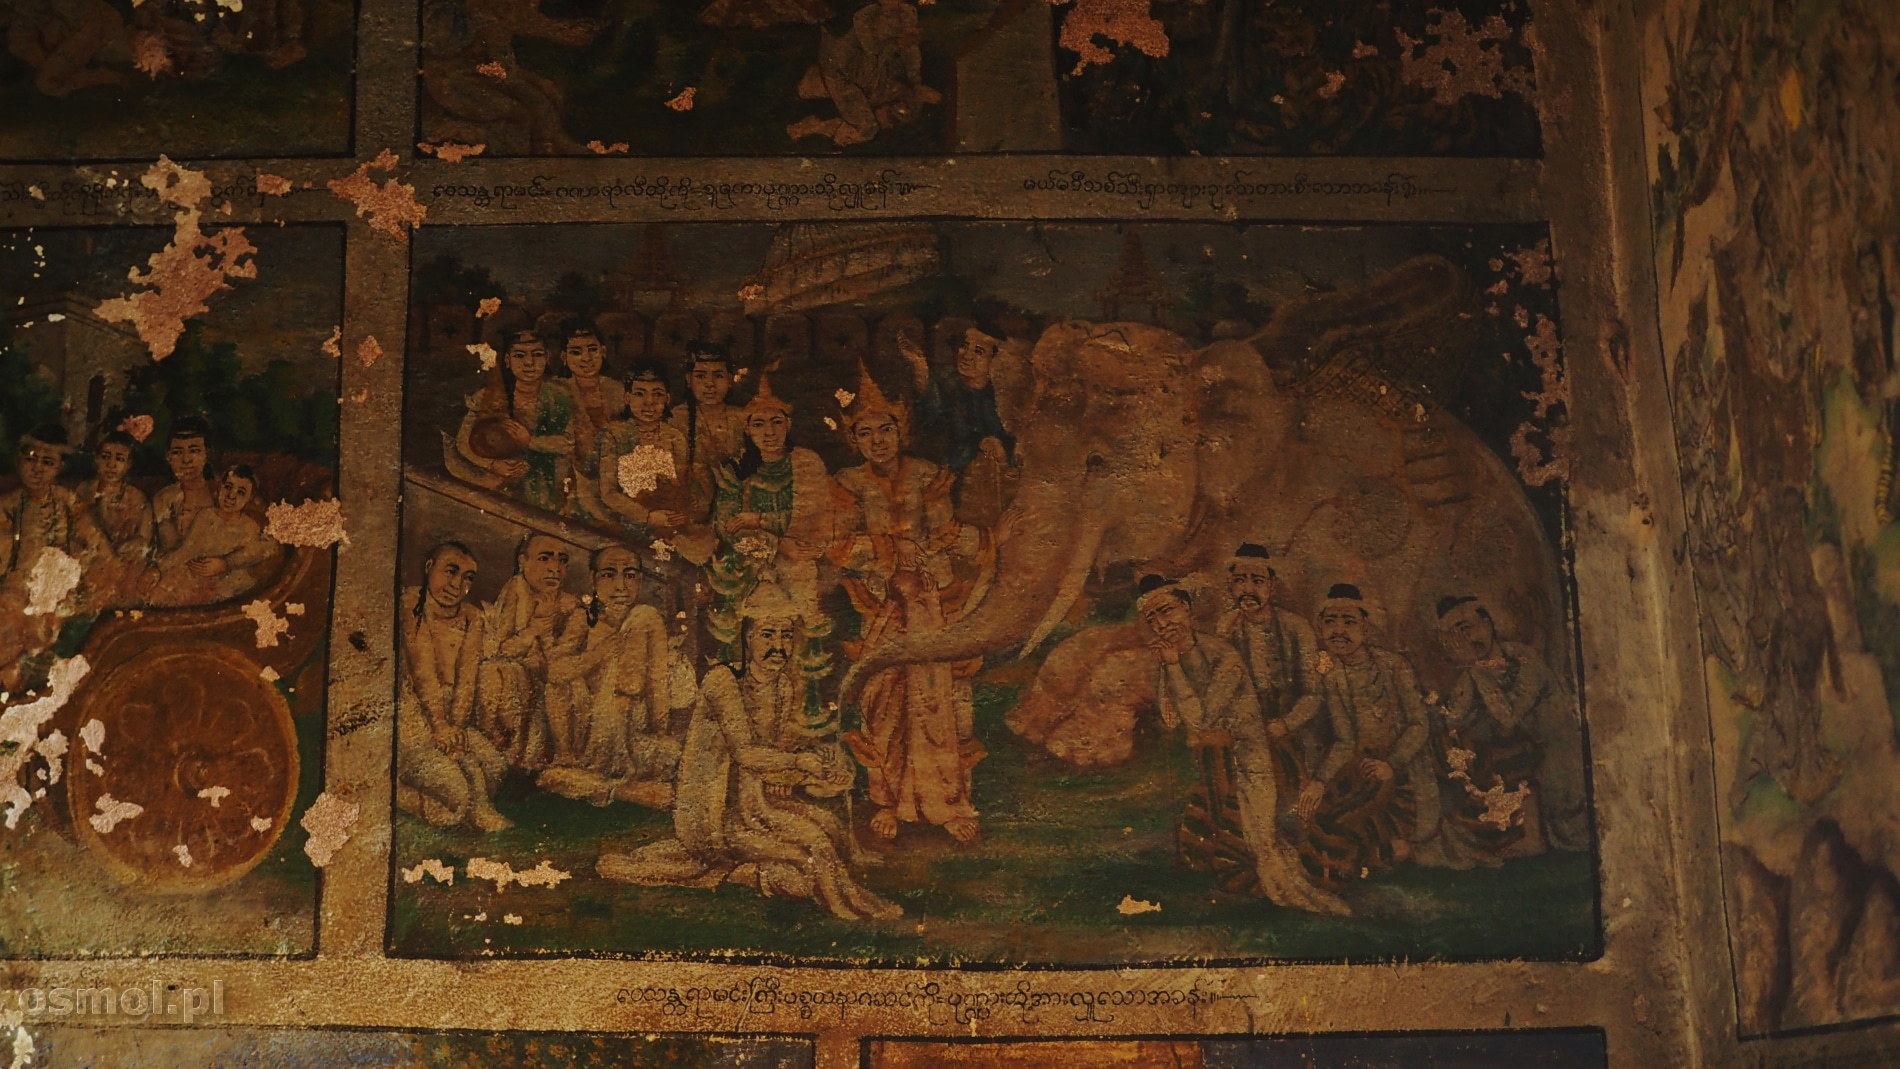 Obrazy na ścianach Pho Win Daung